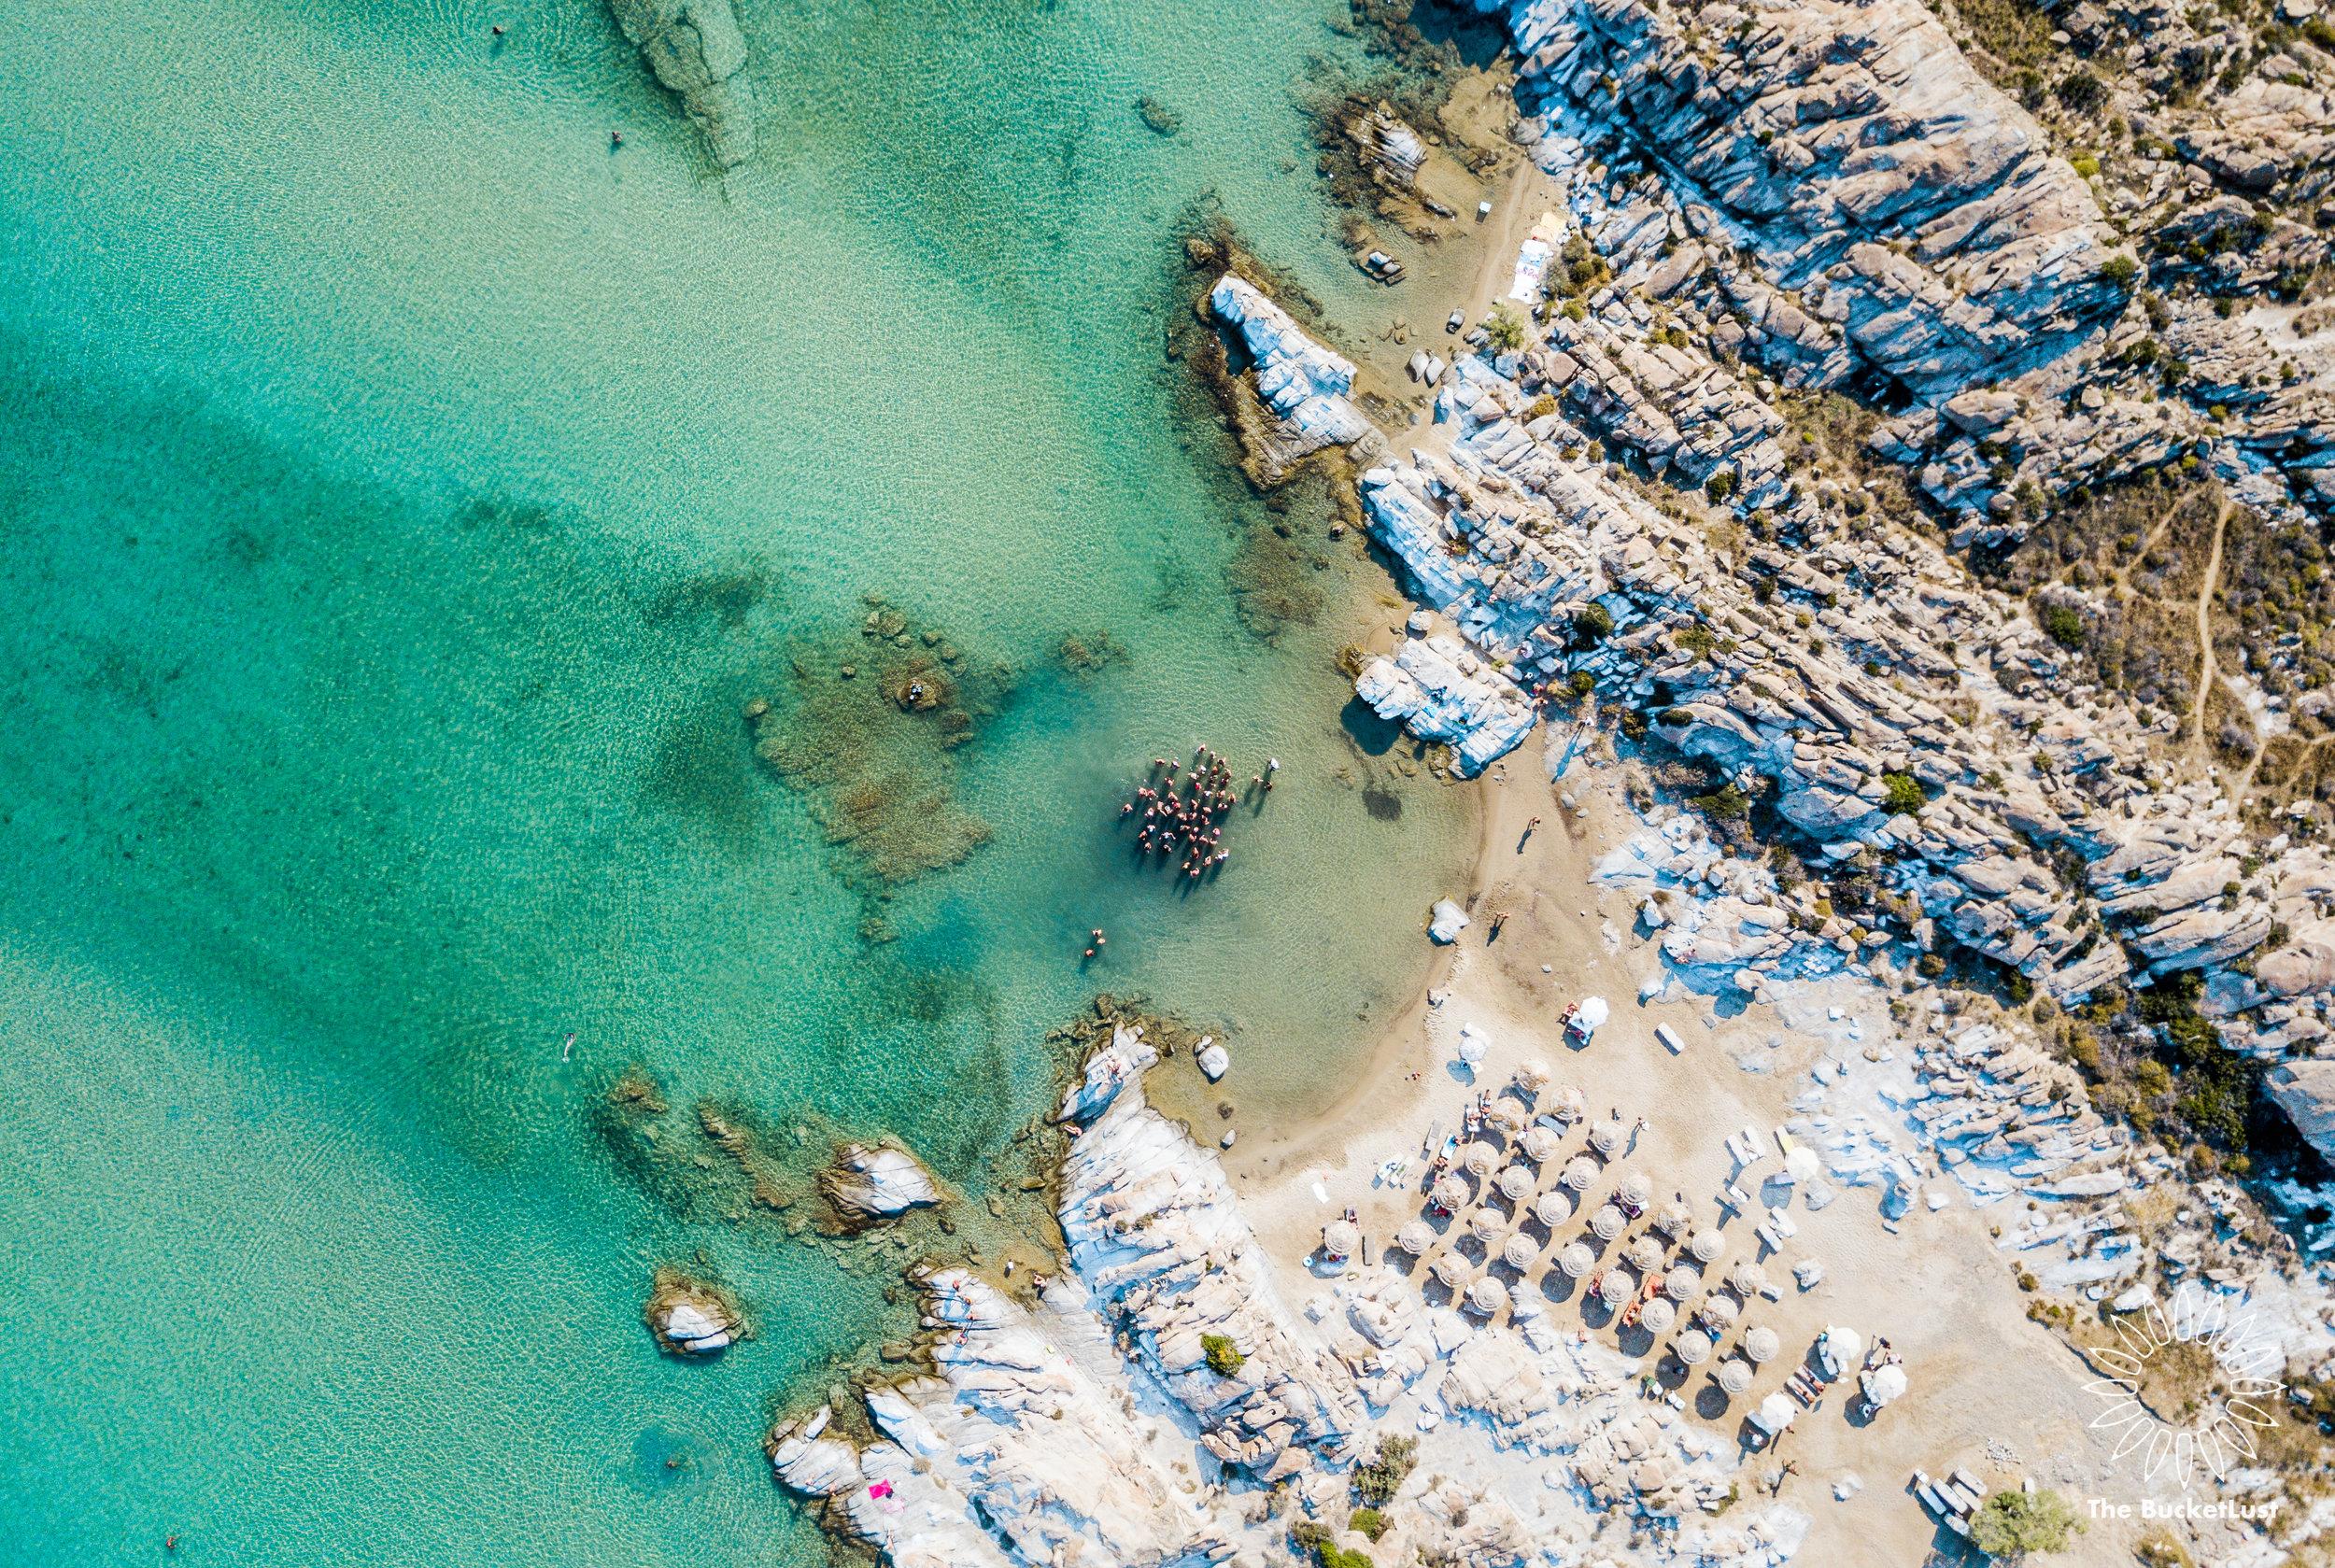 UE Beach Party, Paros, Greece - The Mykonos Route